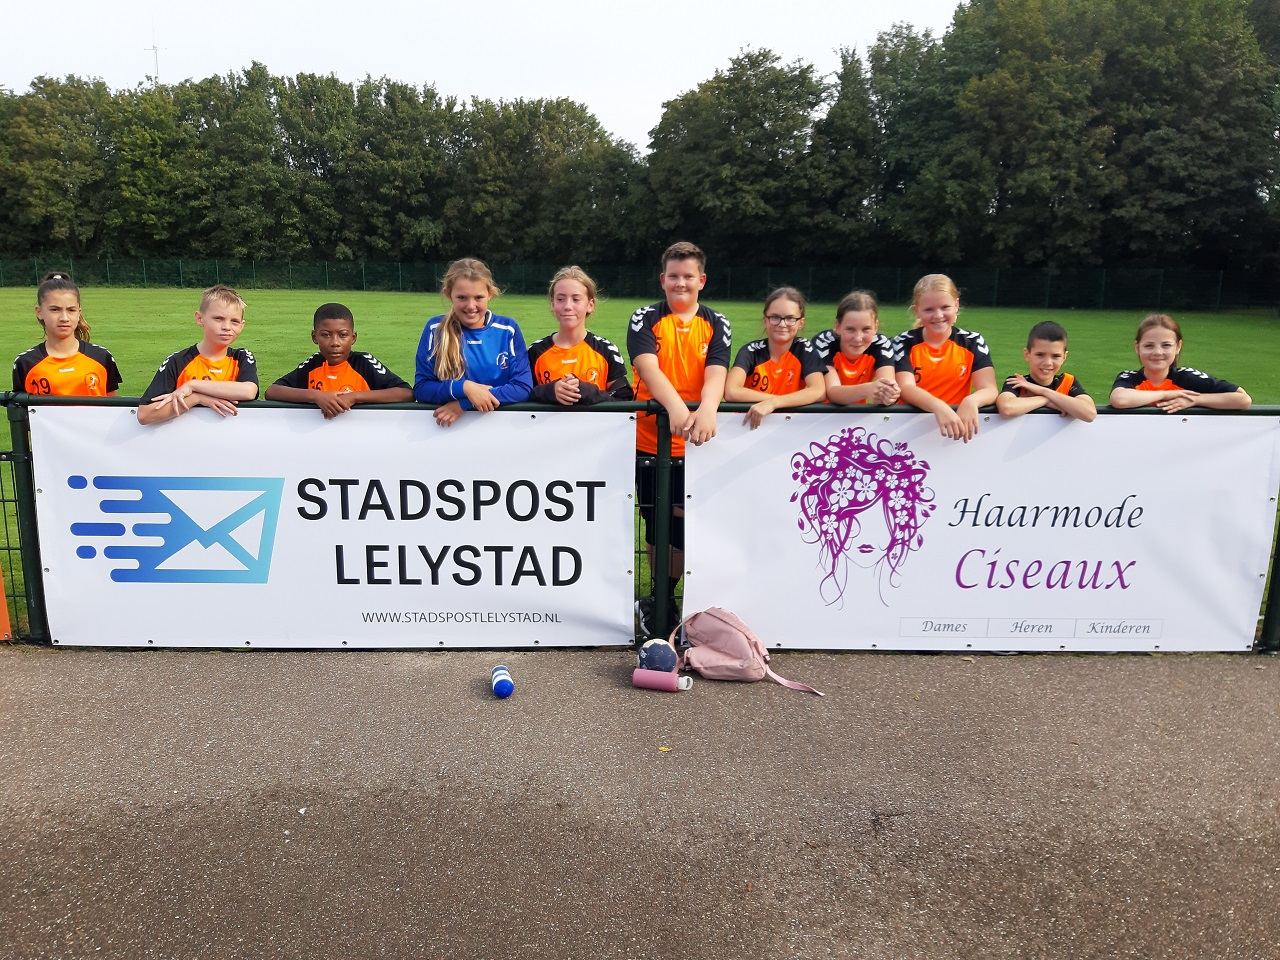 https://www.handbalvereniginglelystad.nl/wp-content/uploads/2020/09/D1_1280.jpg